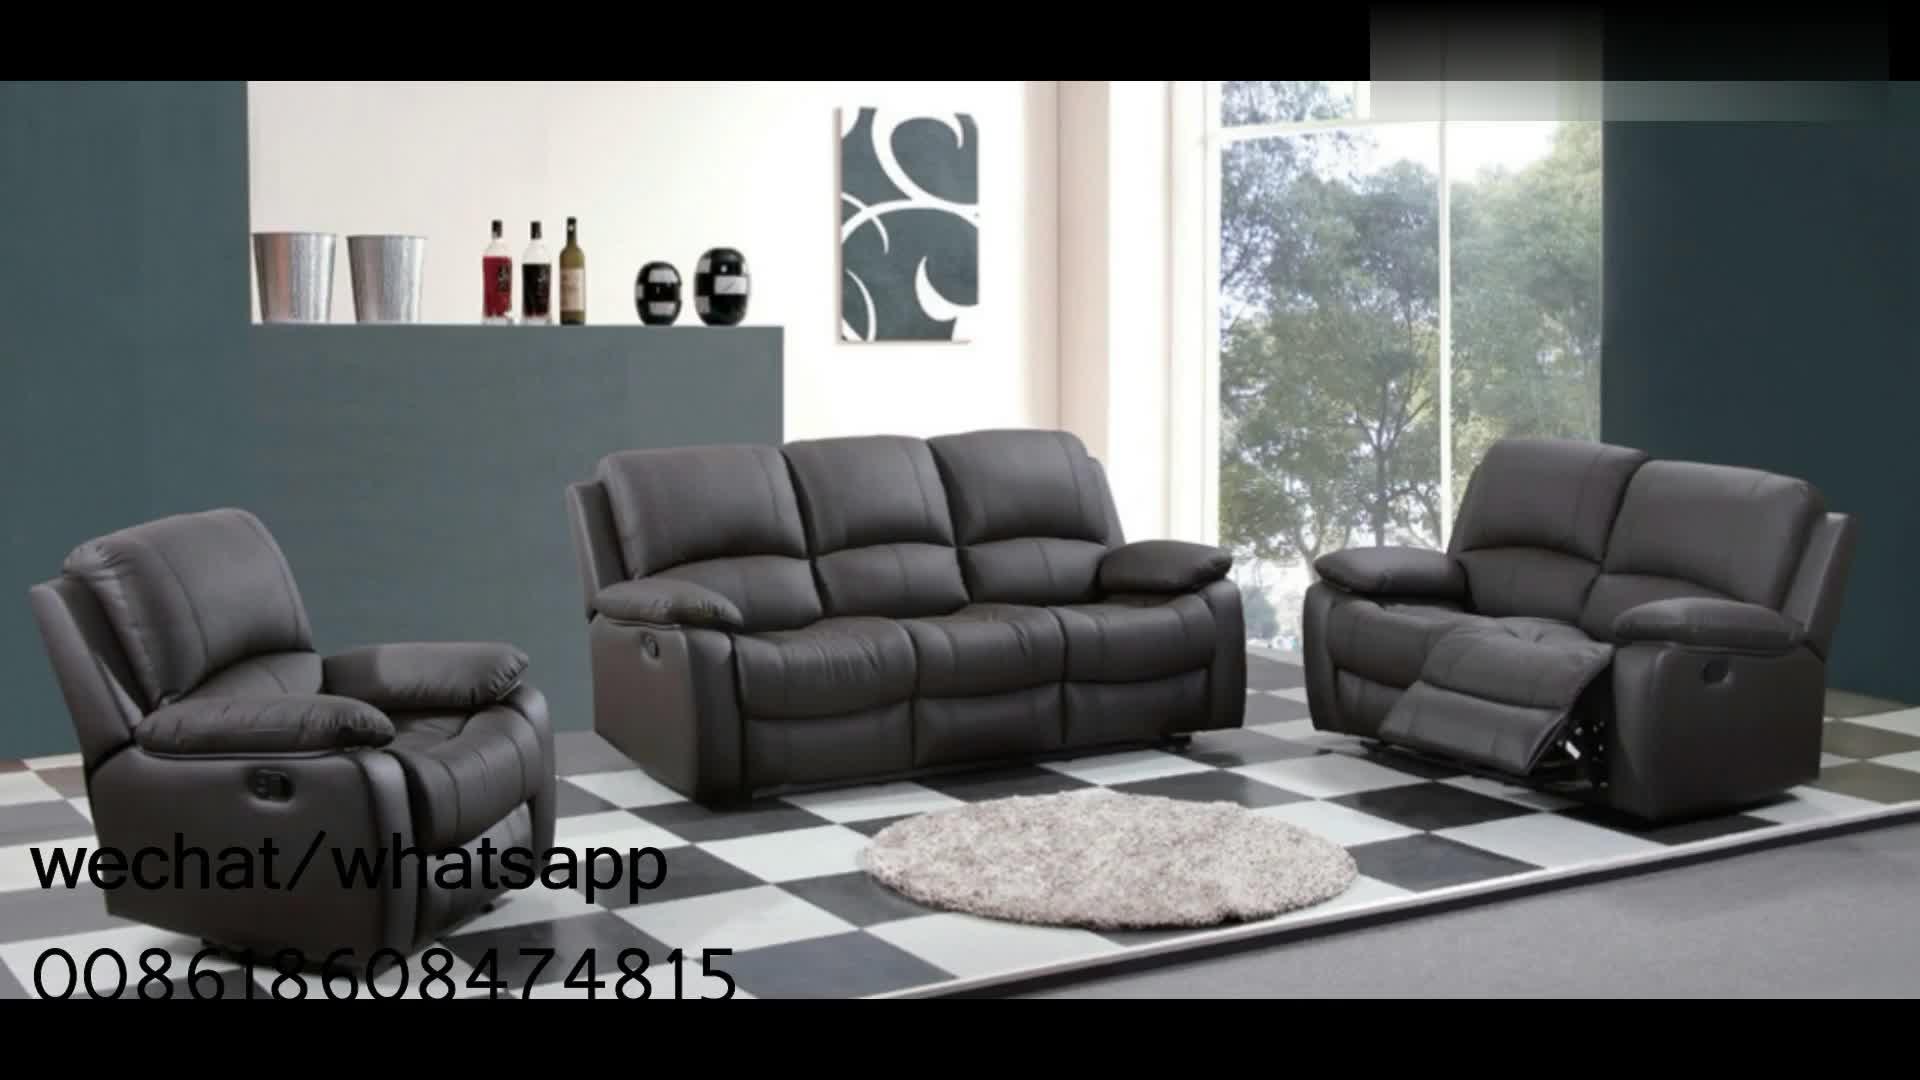 Free sample 현대 genuine leather sofa set Living 룸 체스터 필드 된 로고와 룸 sofa set